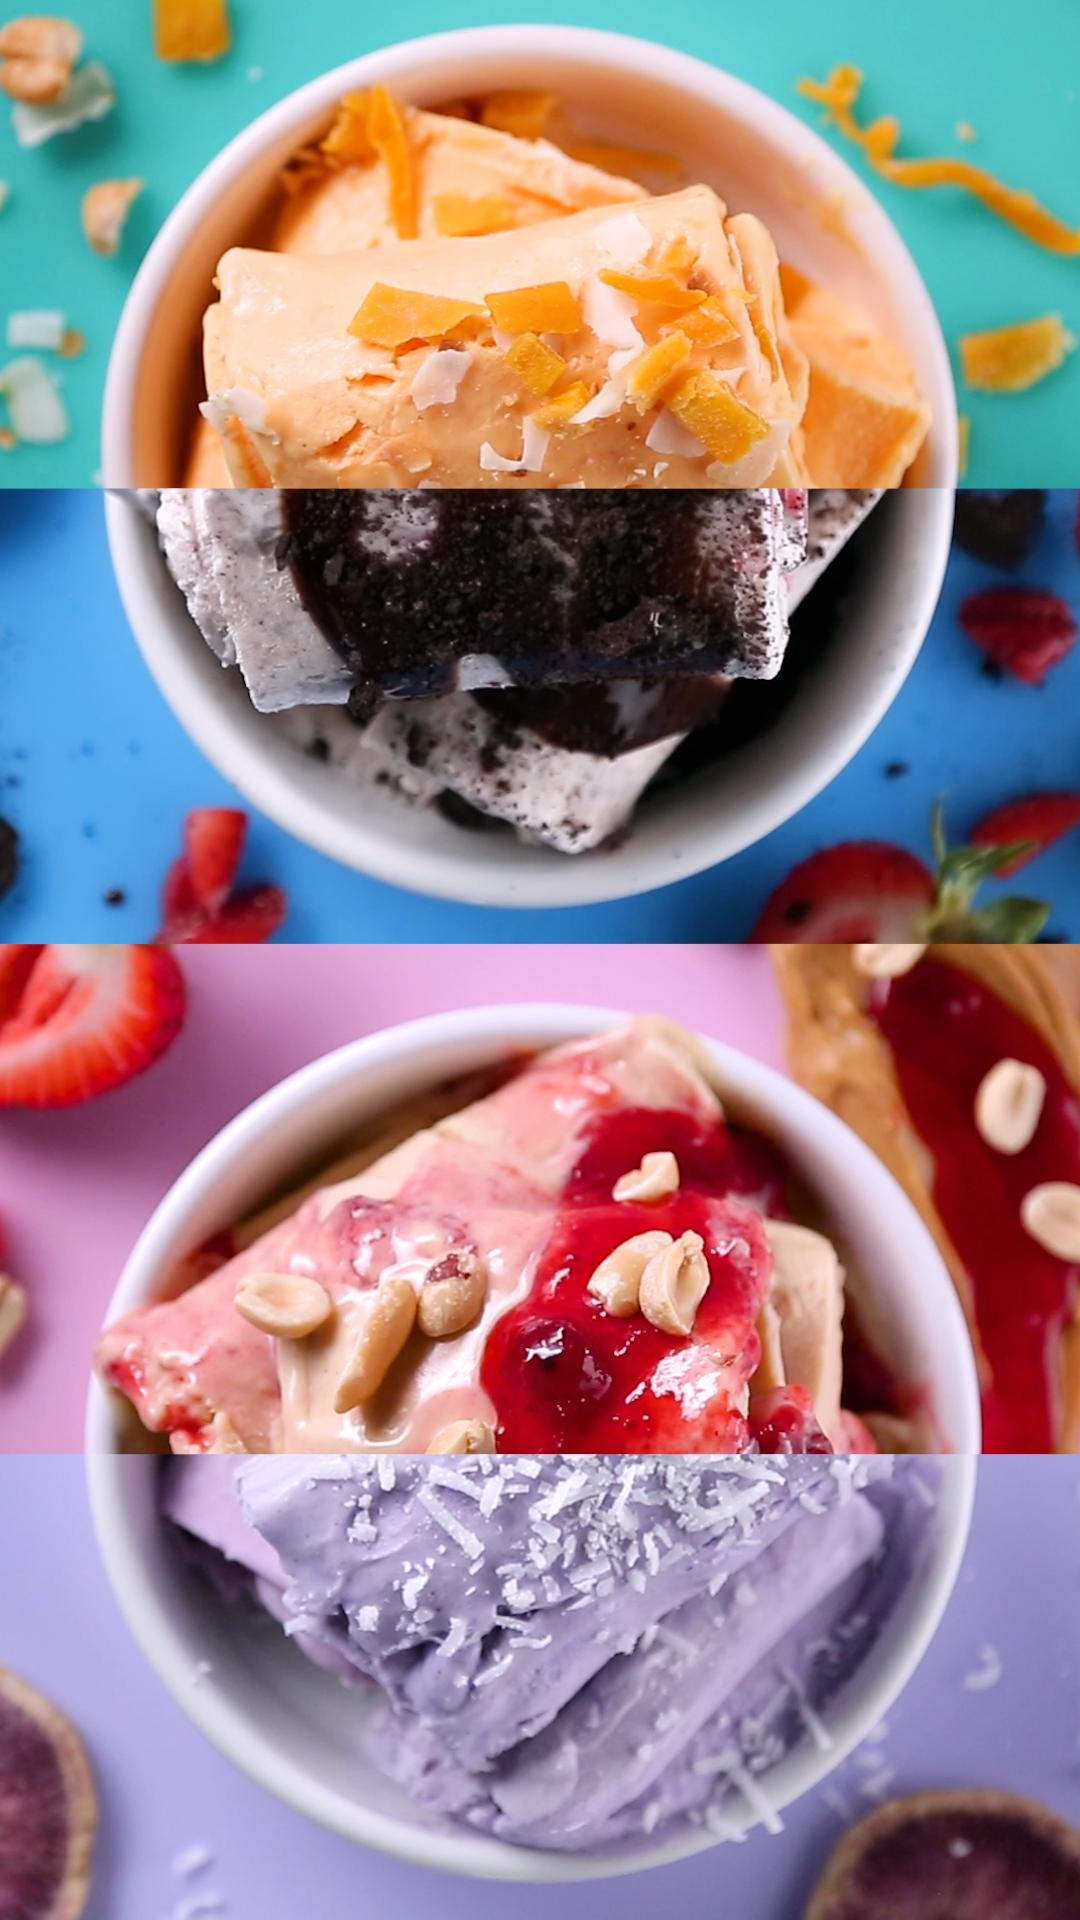 Rolled Ice Cream 4 Ways